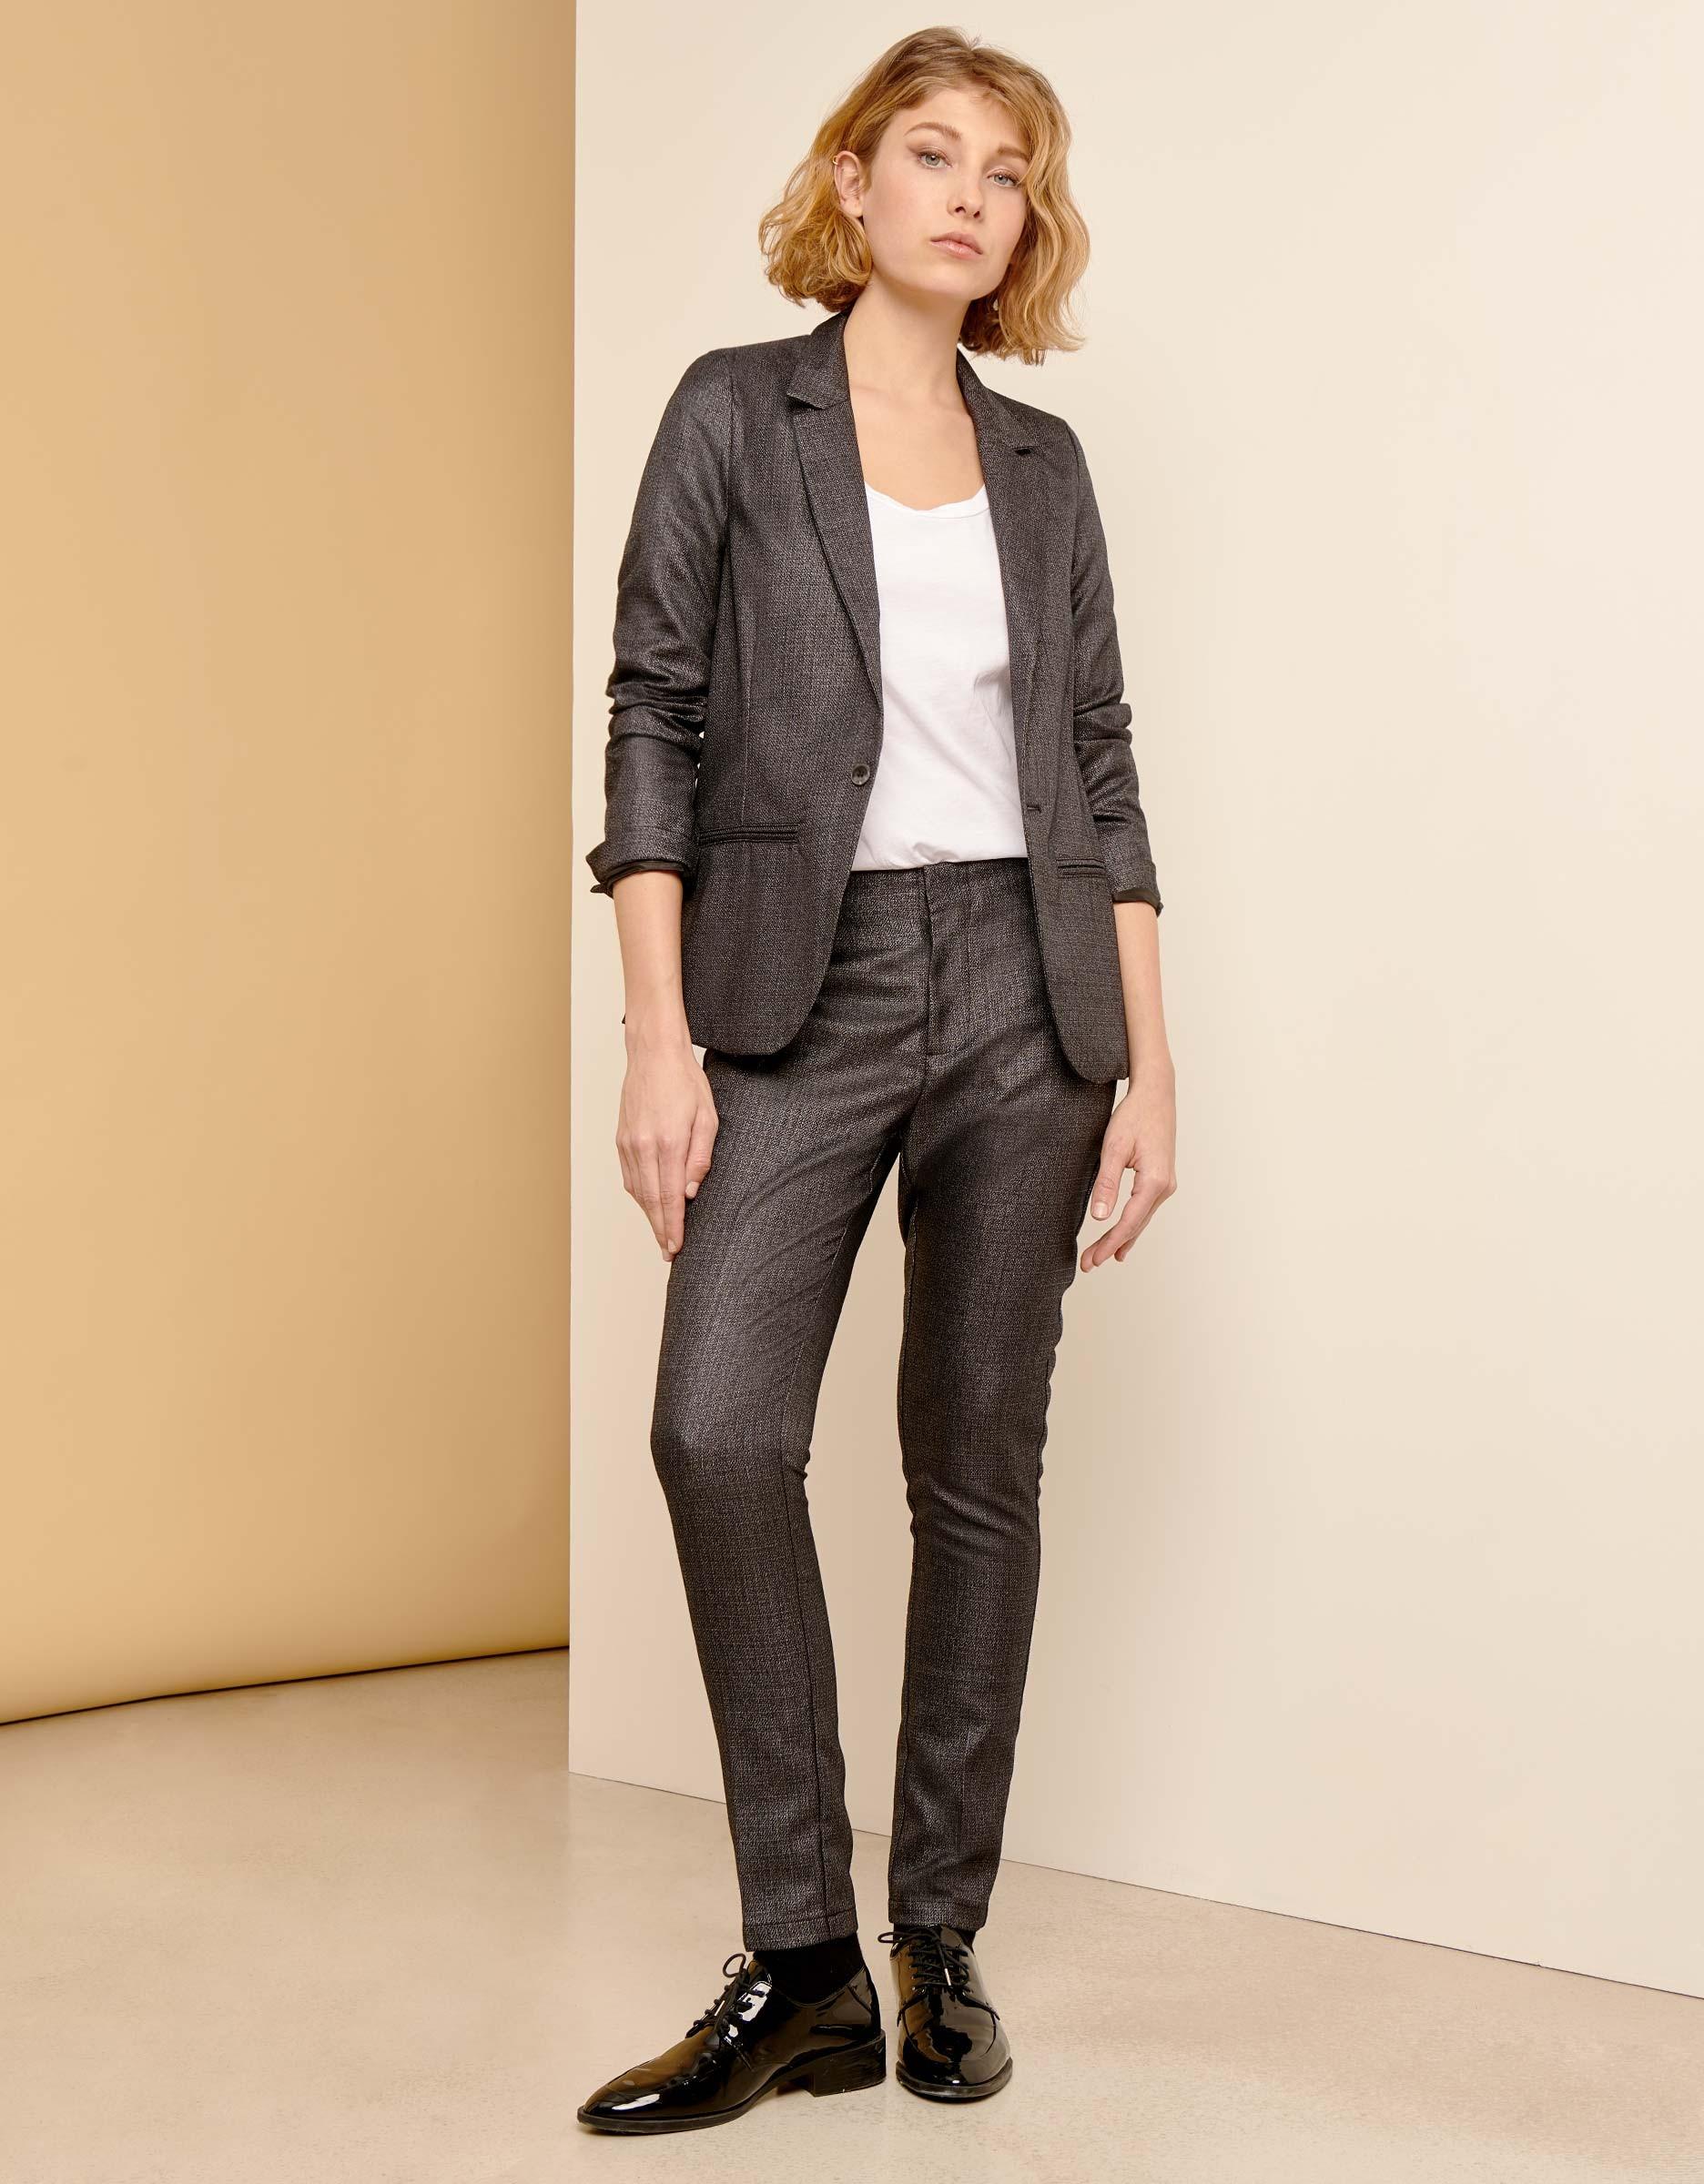 Blazer Jacket Blair Fancy For Women Metallic Black Reiko